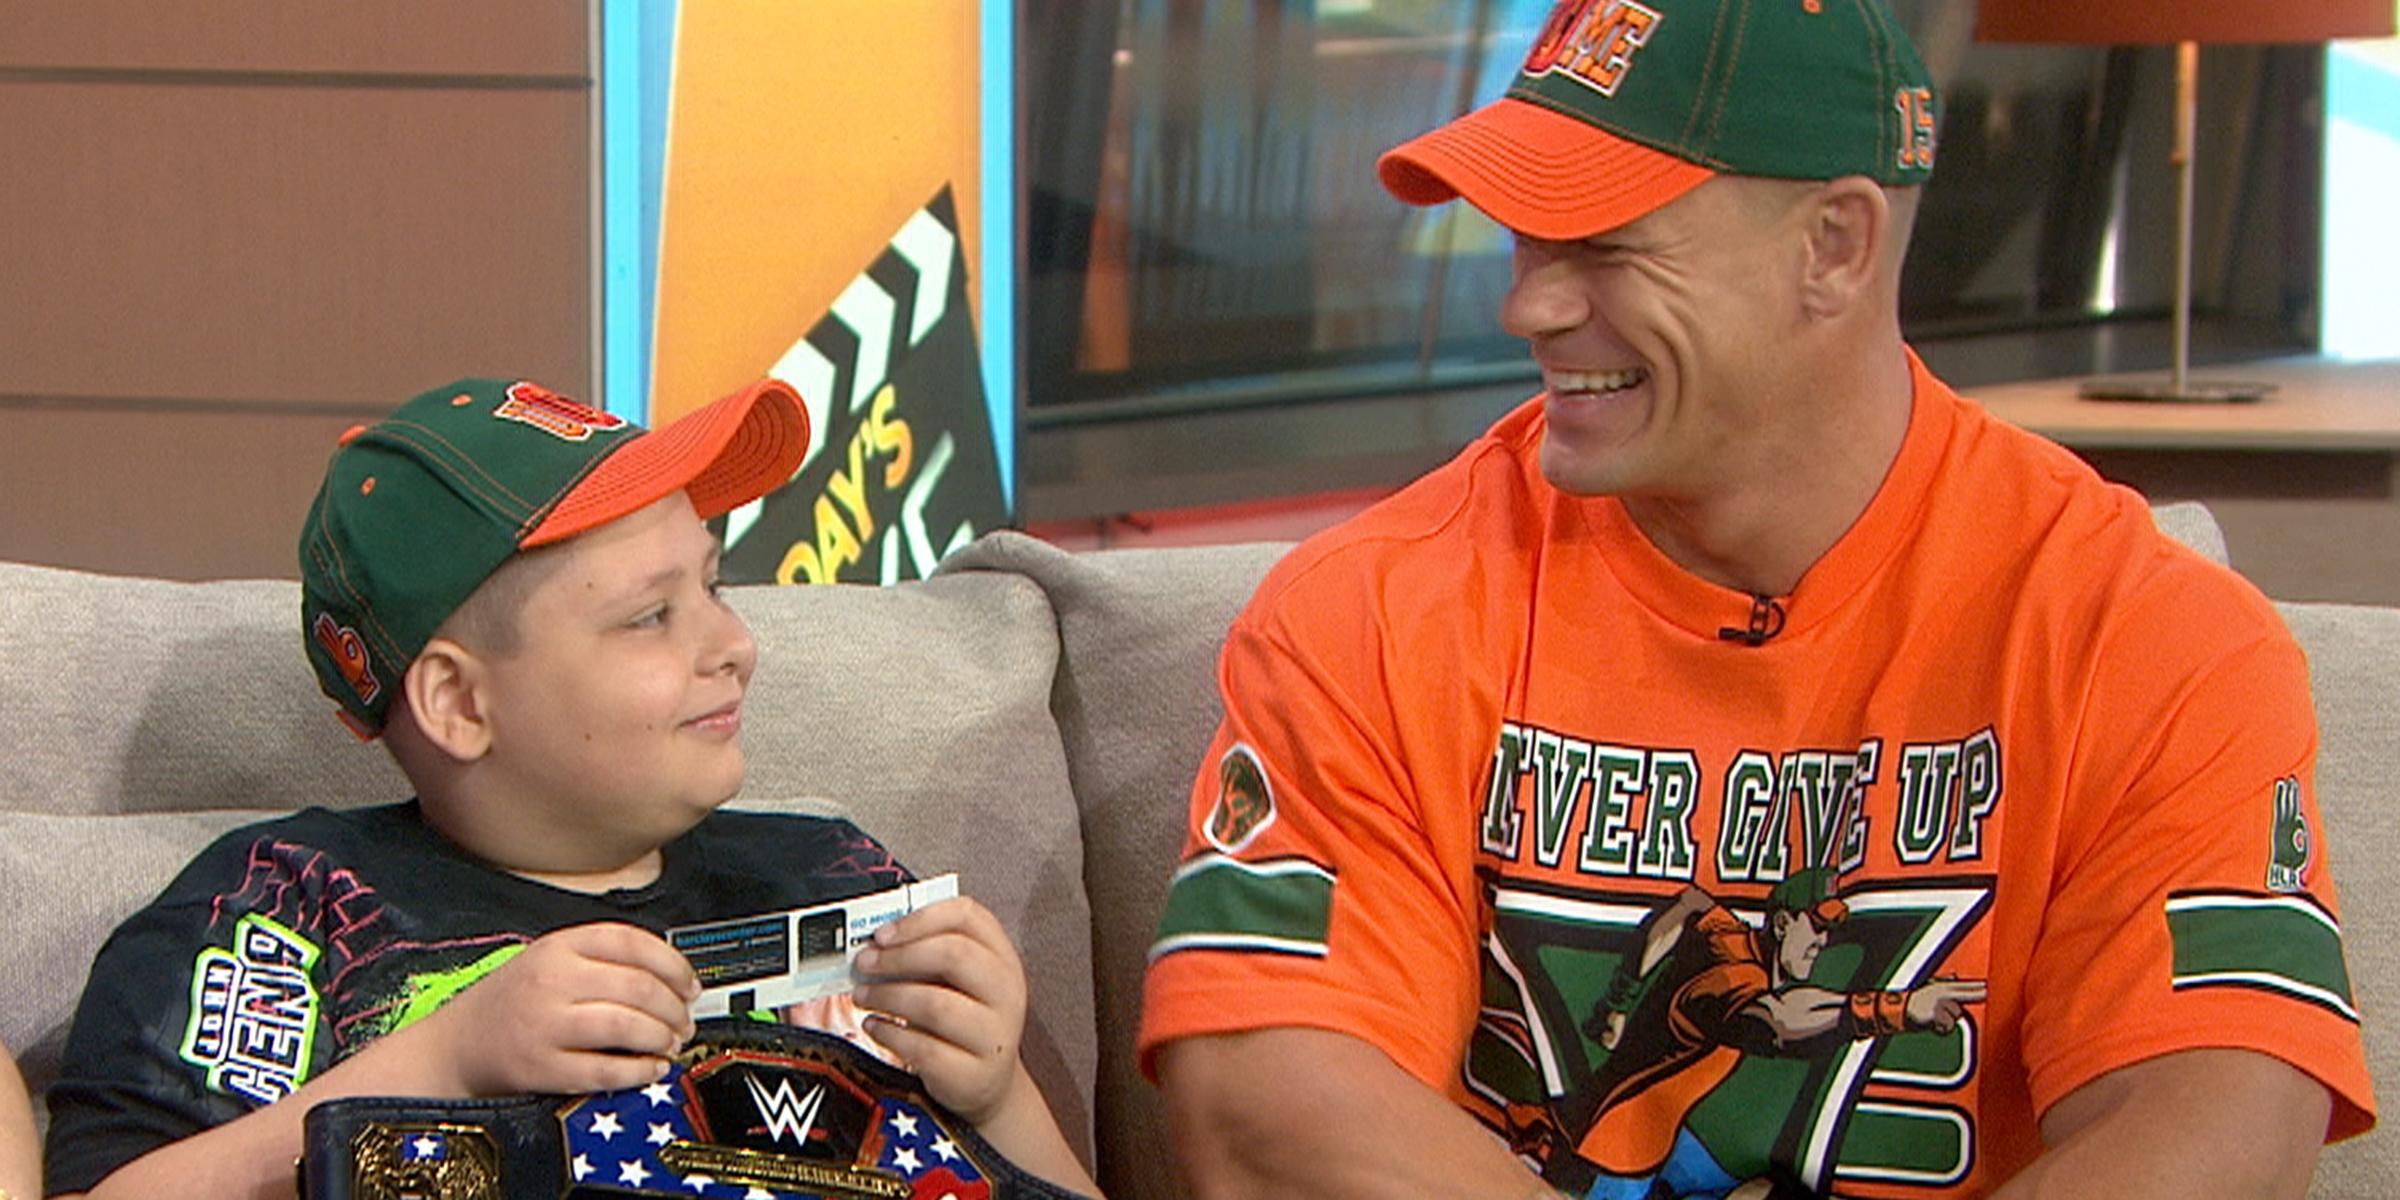 John Cena has fulfilled dreams for 580 Make-A-Wish kids